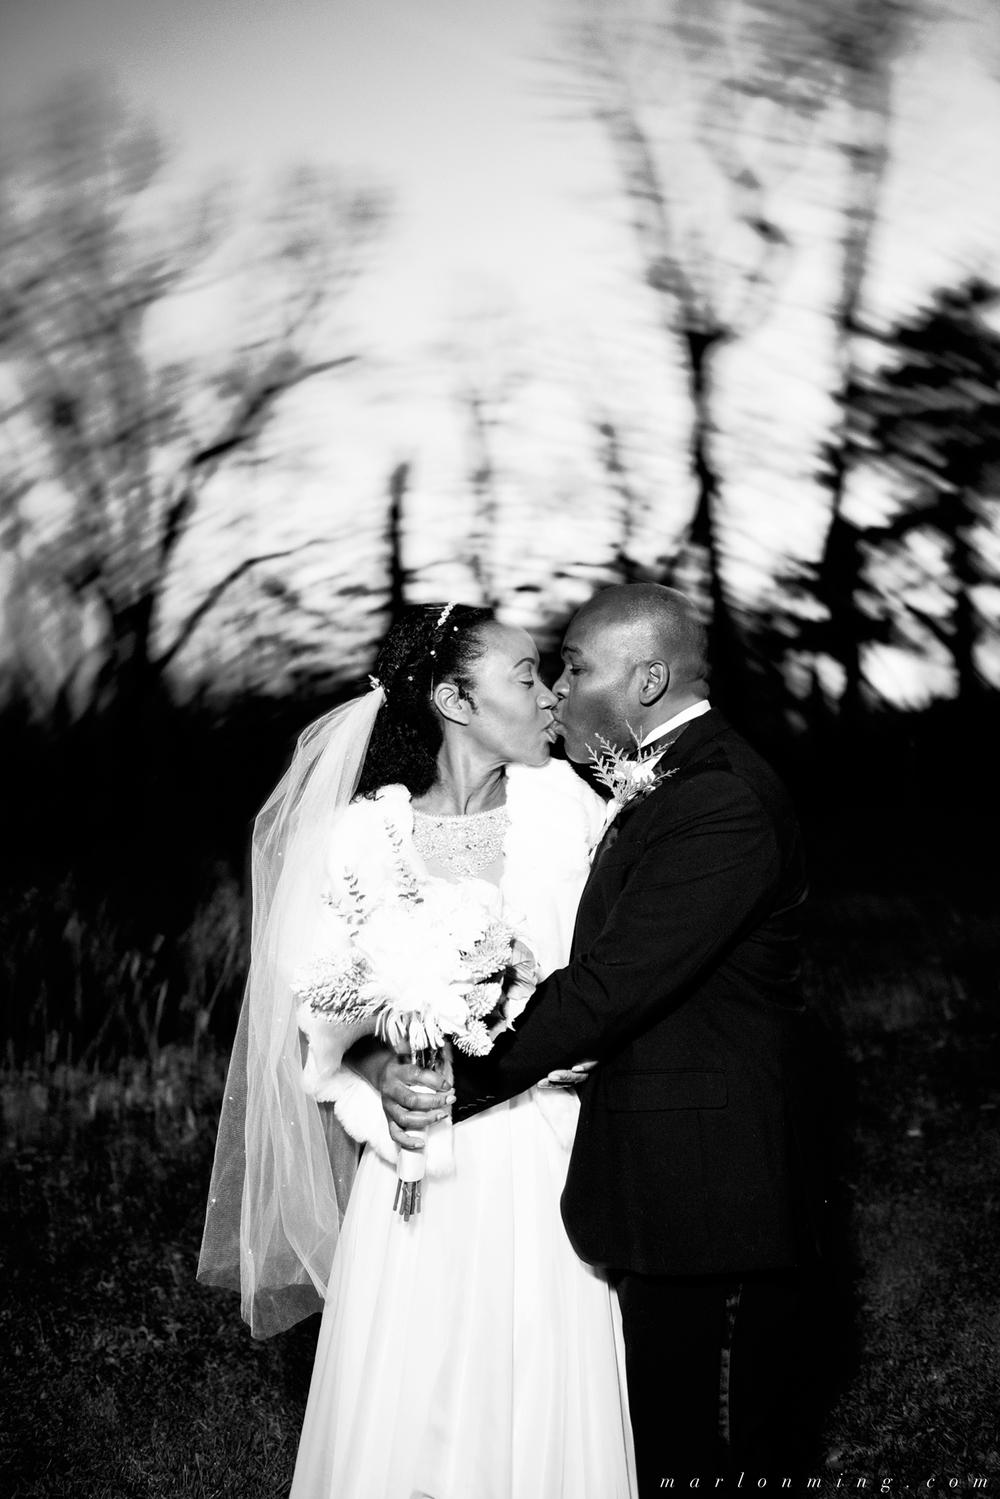 A Classic Baltimore Wedding Vows Renewal MARLON MING